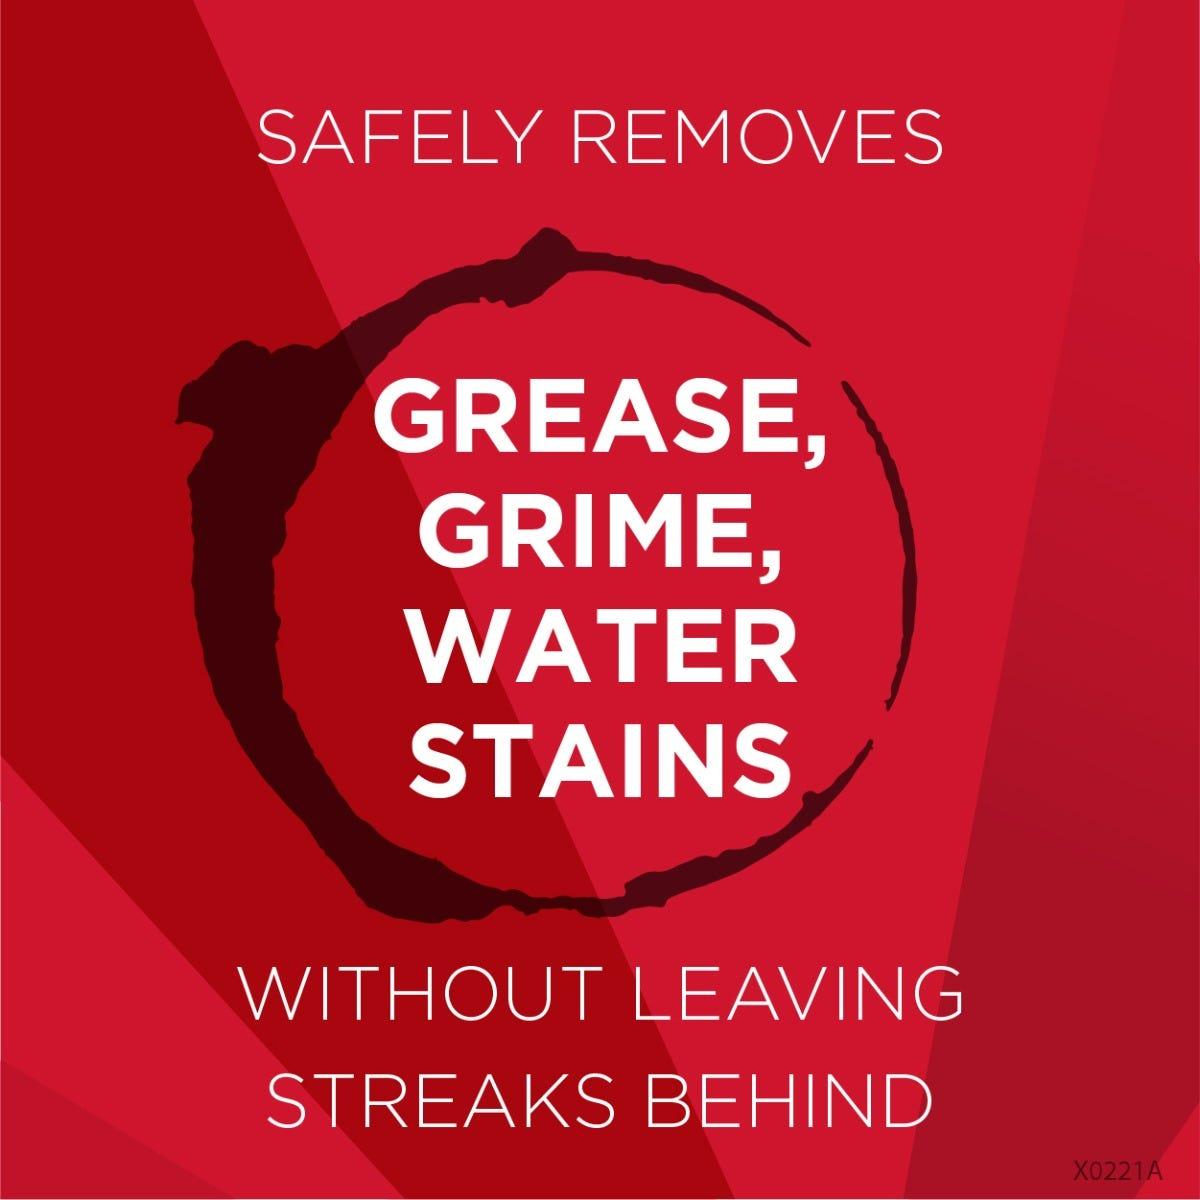 https://googone.com/media/catalog/product/m/a/magic_granite_cleaner_benefits_1.jpg